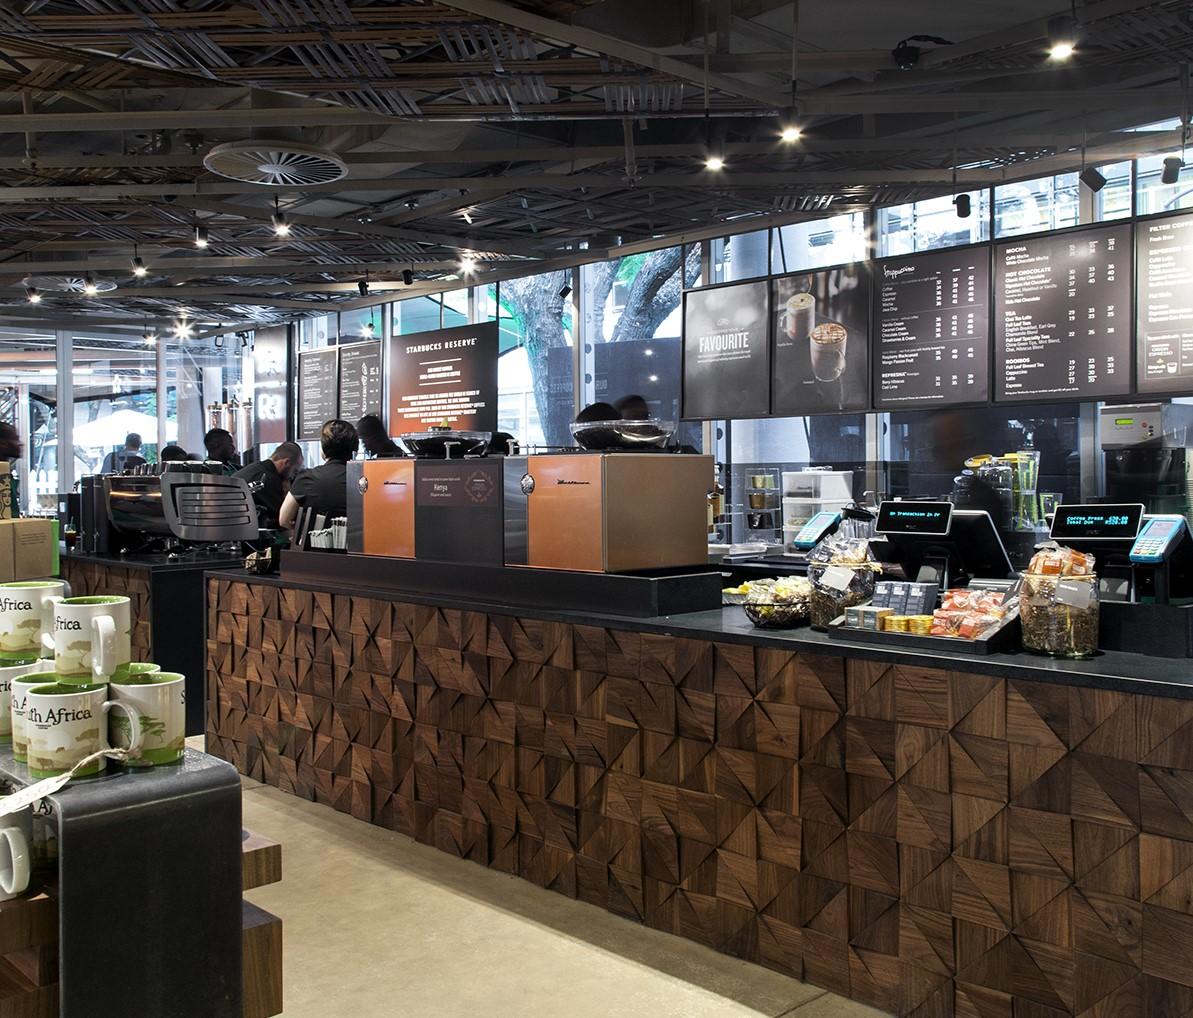 Starbucks South Africa